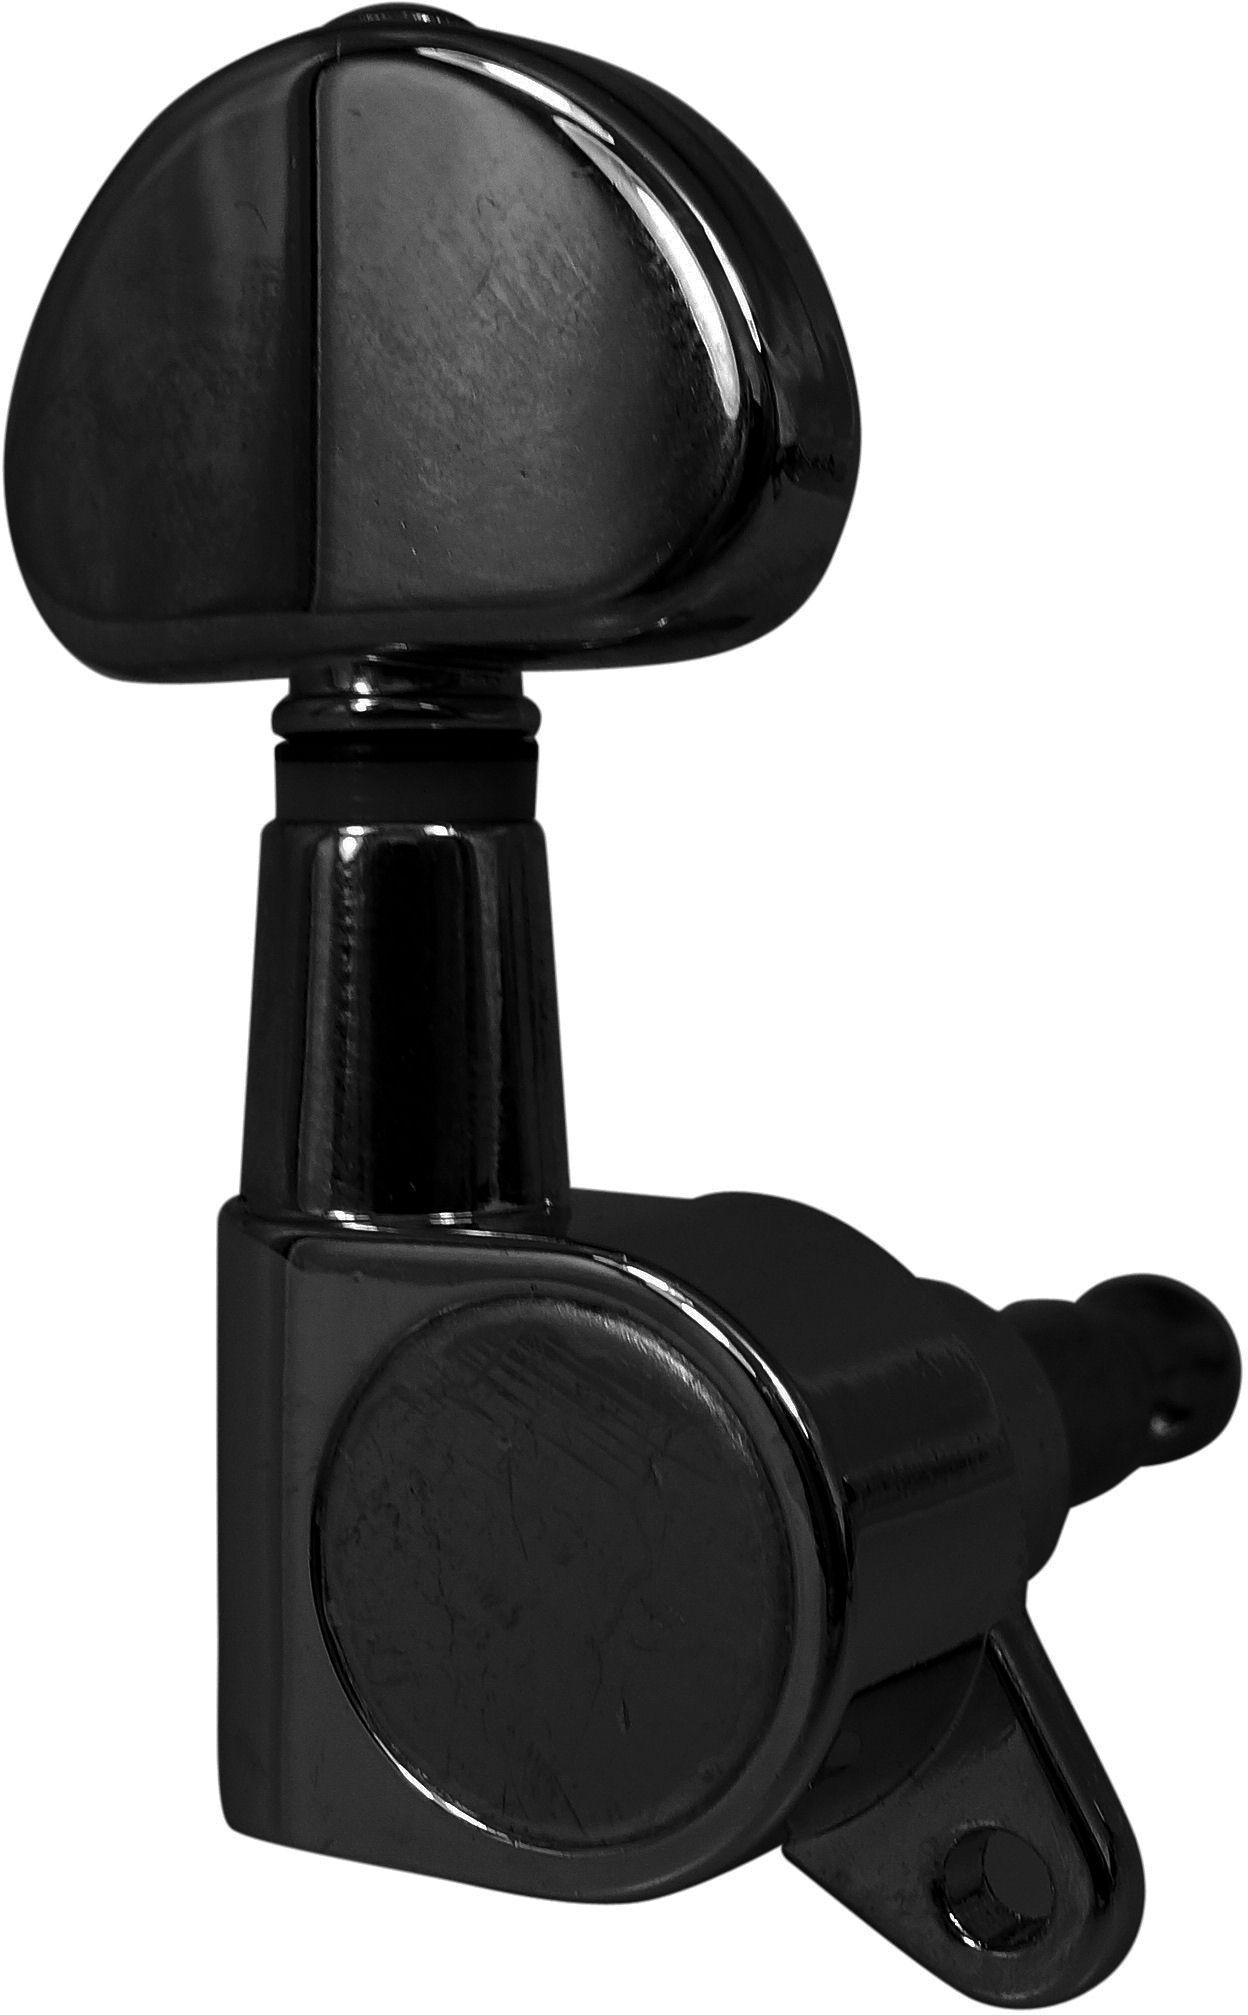 Toronzo Machine heads GP-3L3R-DCDX-Black